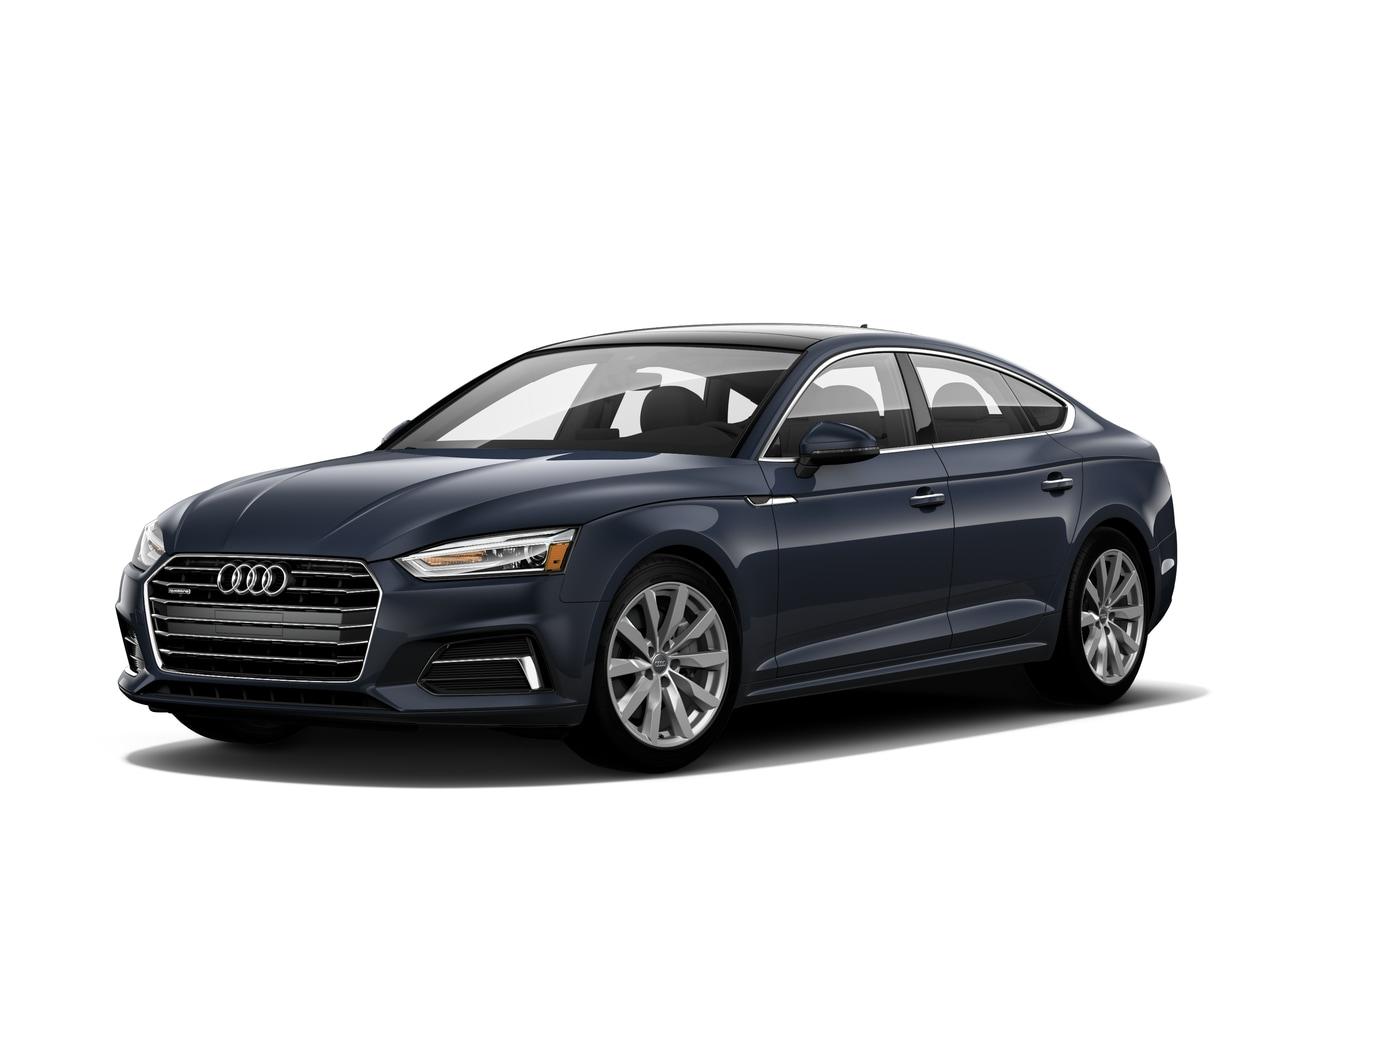 2018 Audi A5 Hatchback